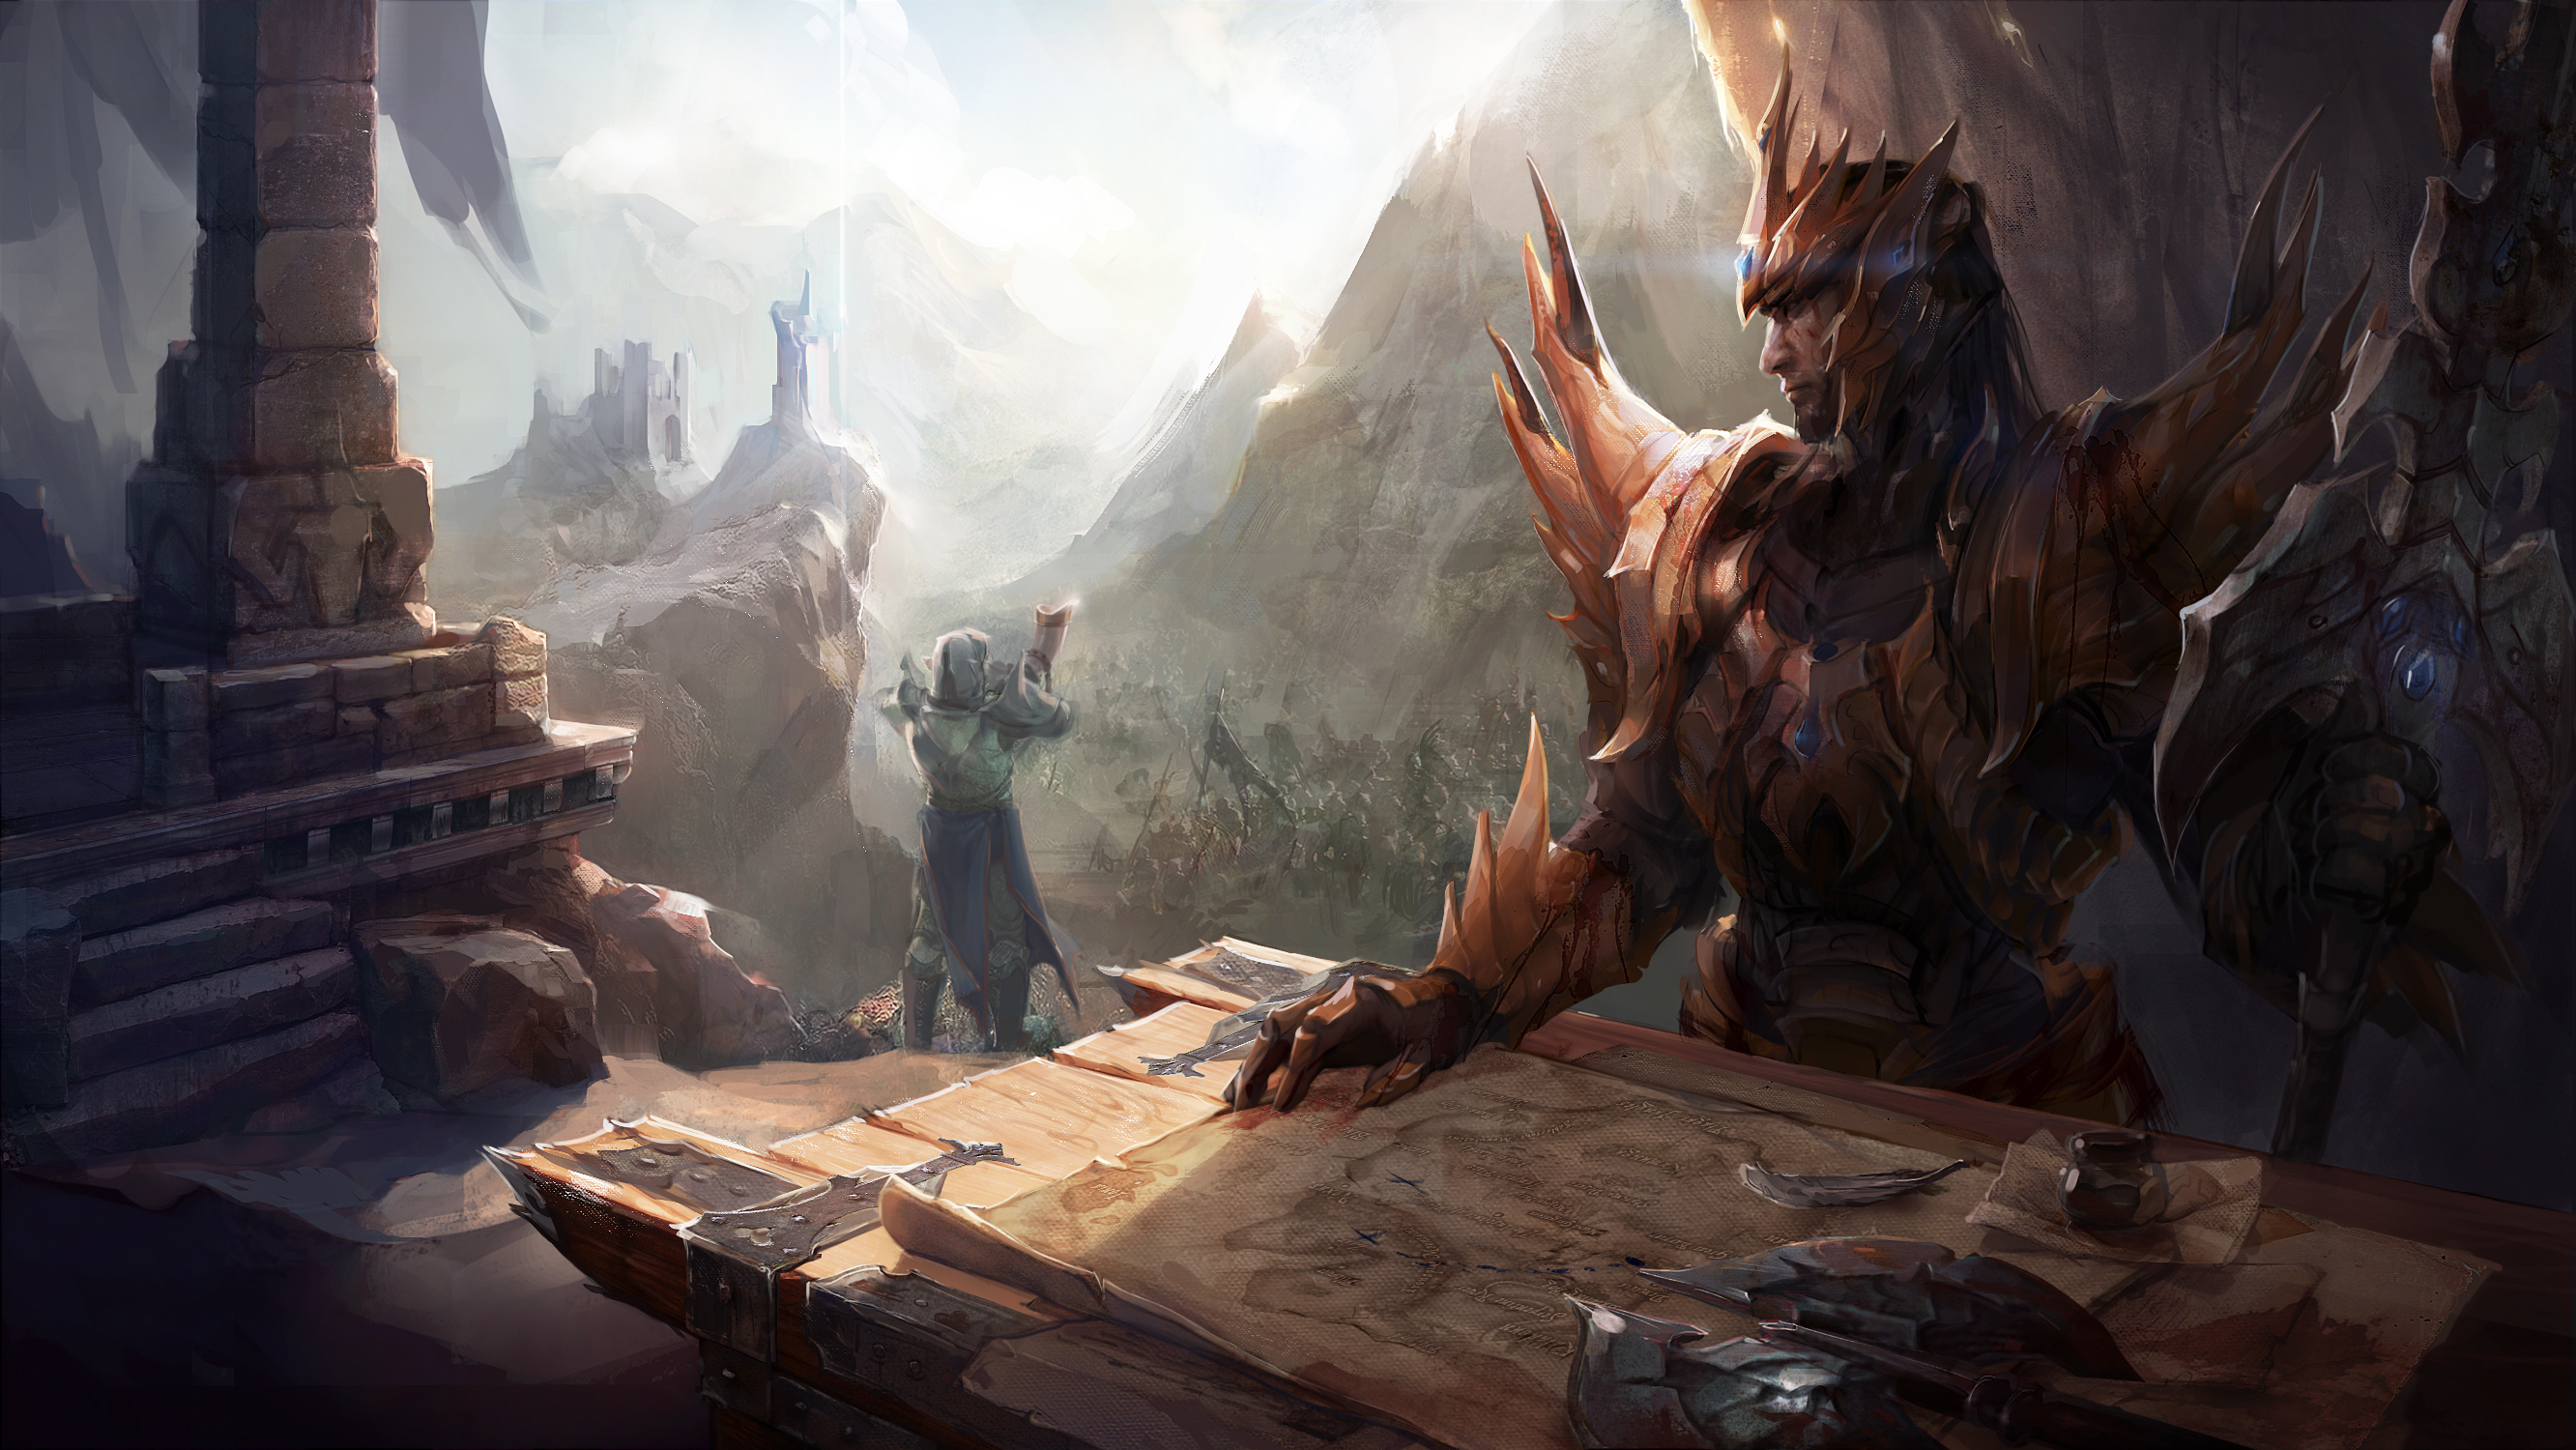 Jarvan scene for Jeremy Gaming Curios by EwaLabak